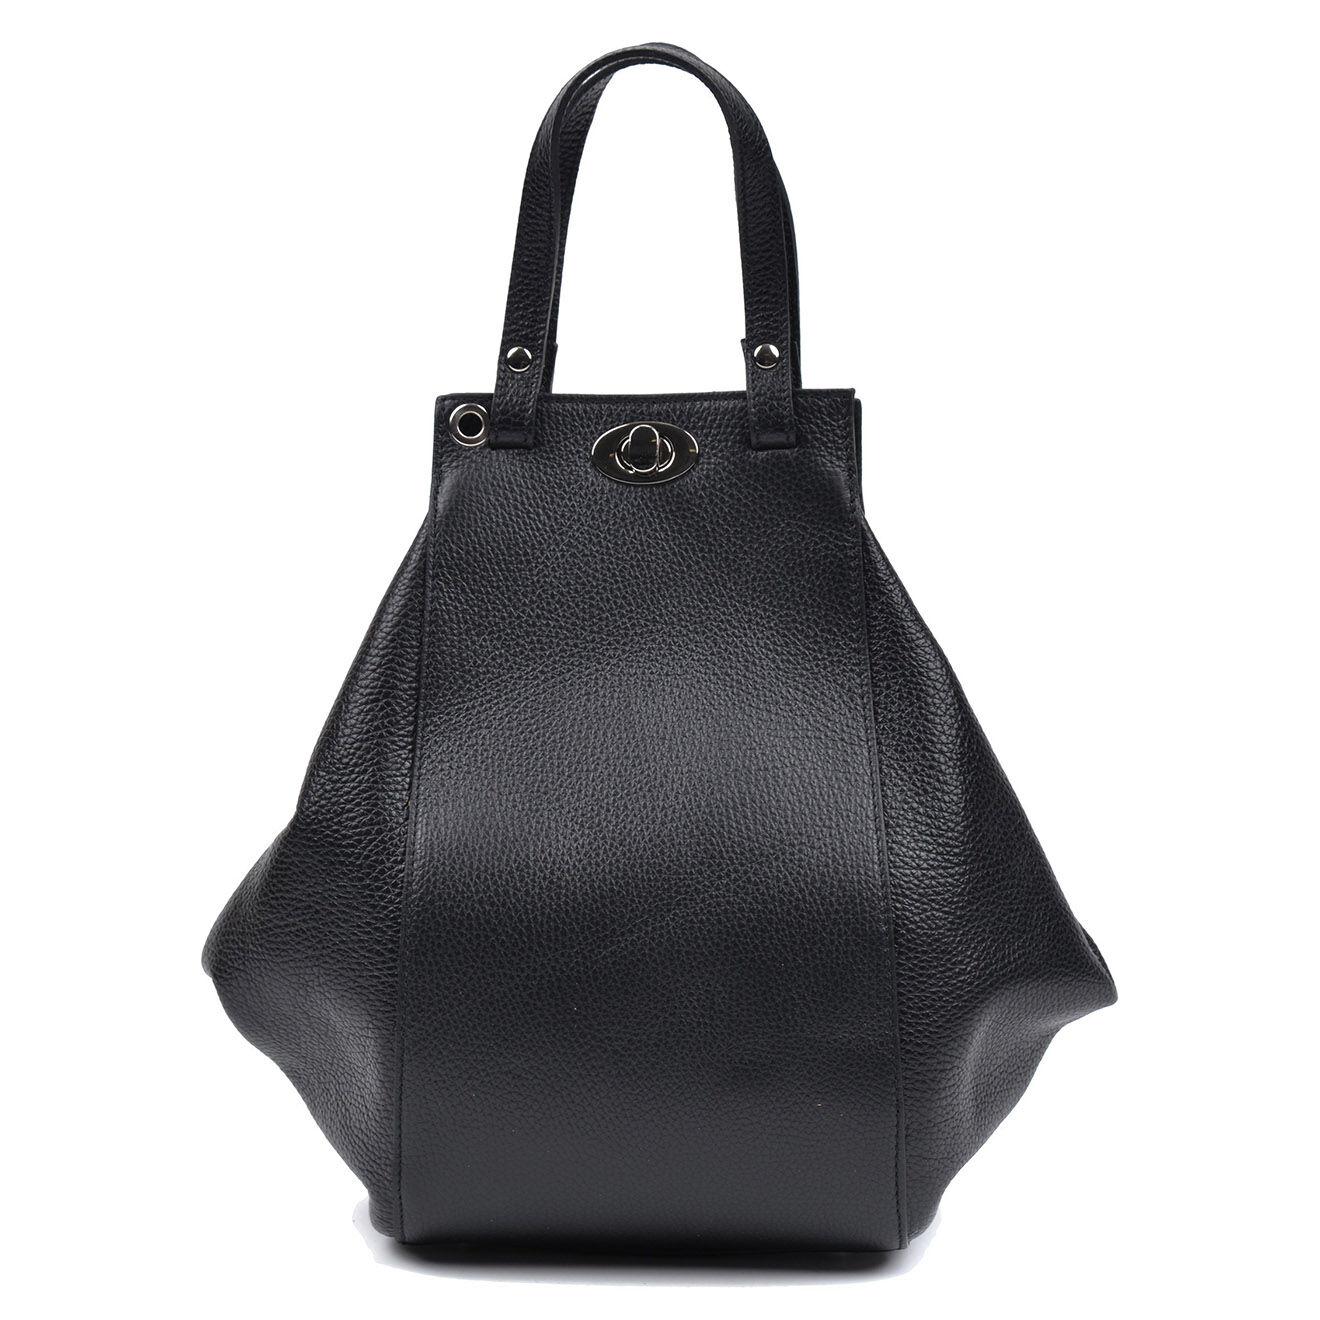 Sac en Cuir Eliana noir - 33x38x6.5 cm